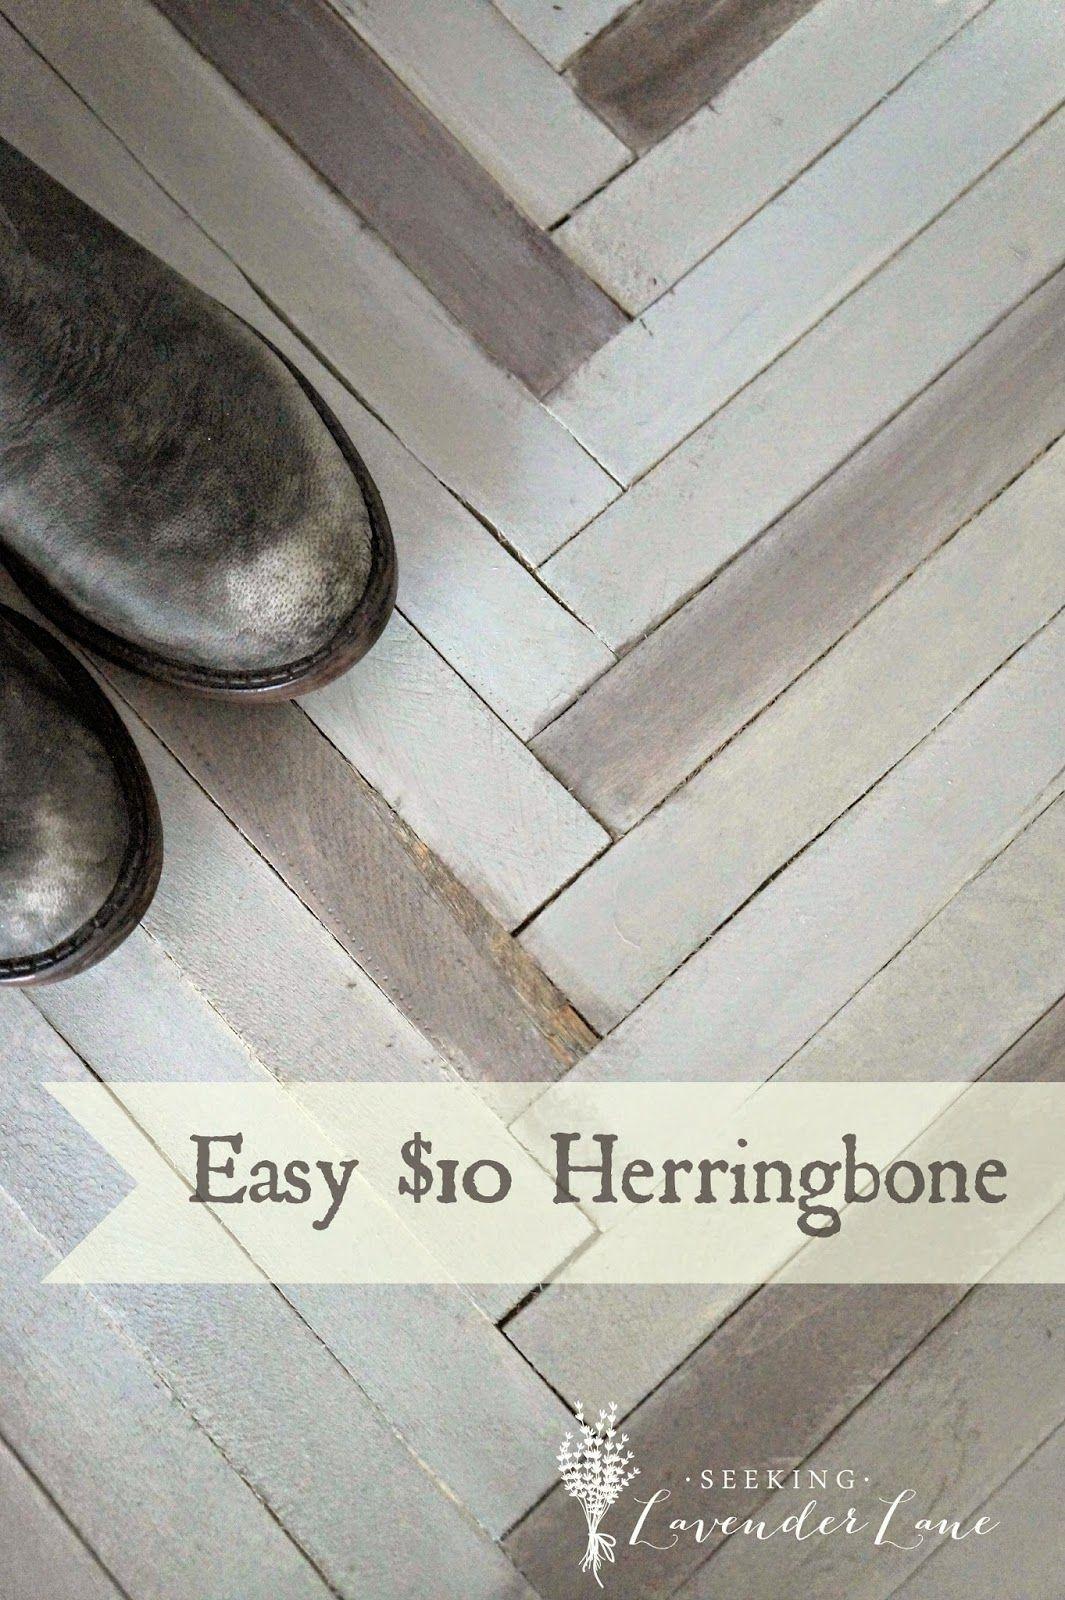 Seeking Lavender Lane: Herringbone DIY for $10